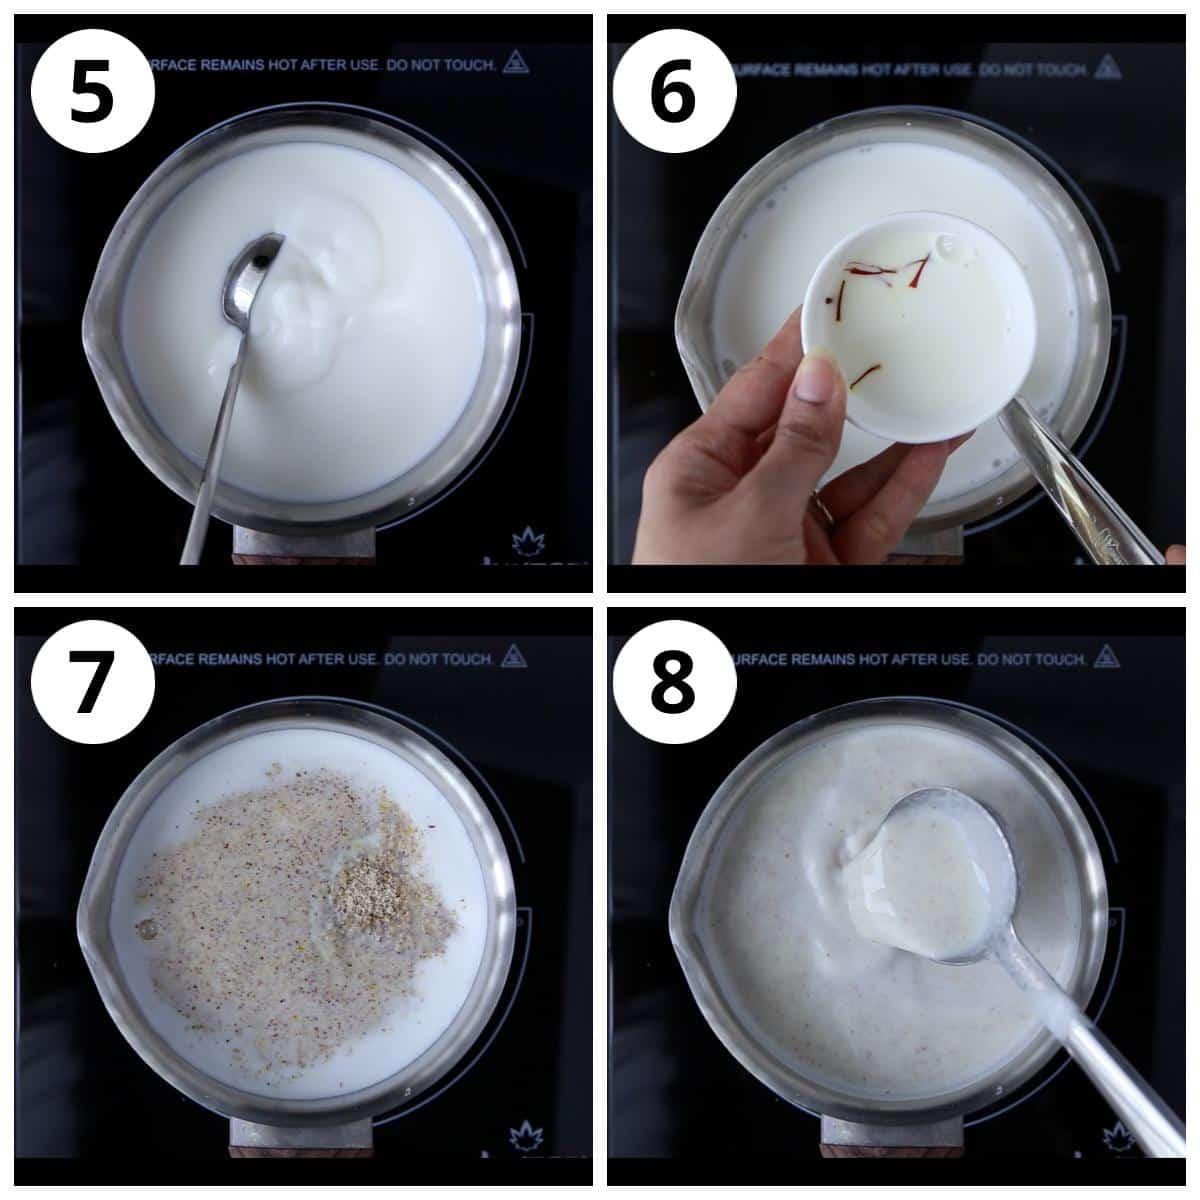 Steps to make thandai milk by boiling the milk, adding sugar and thandai powder